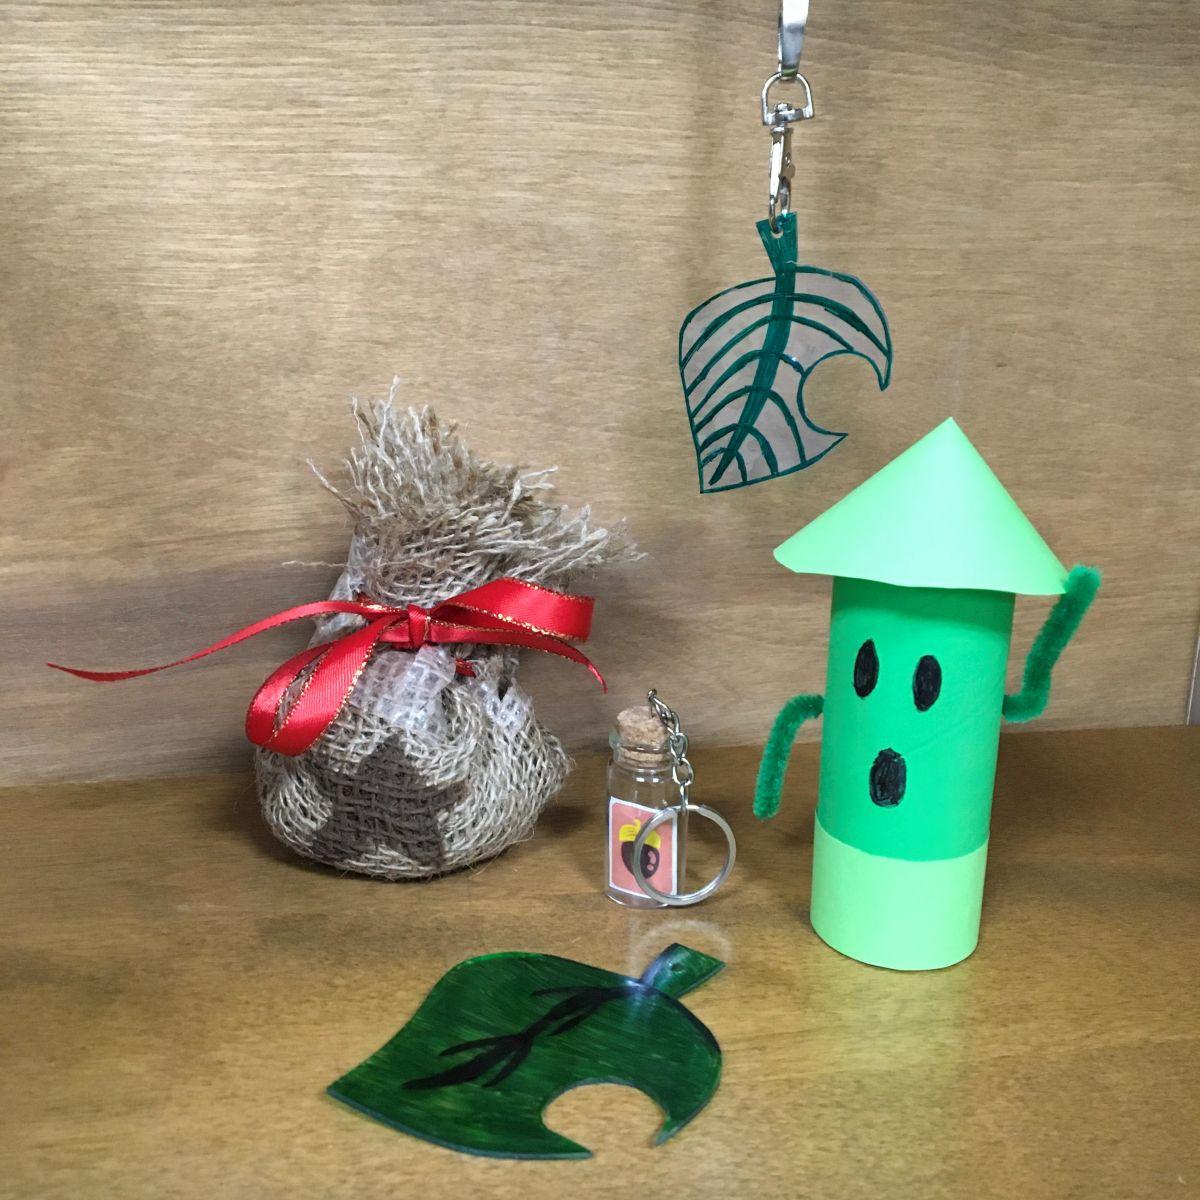 Animal Crossing Crafts